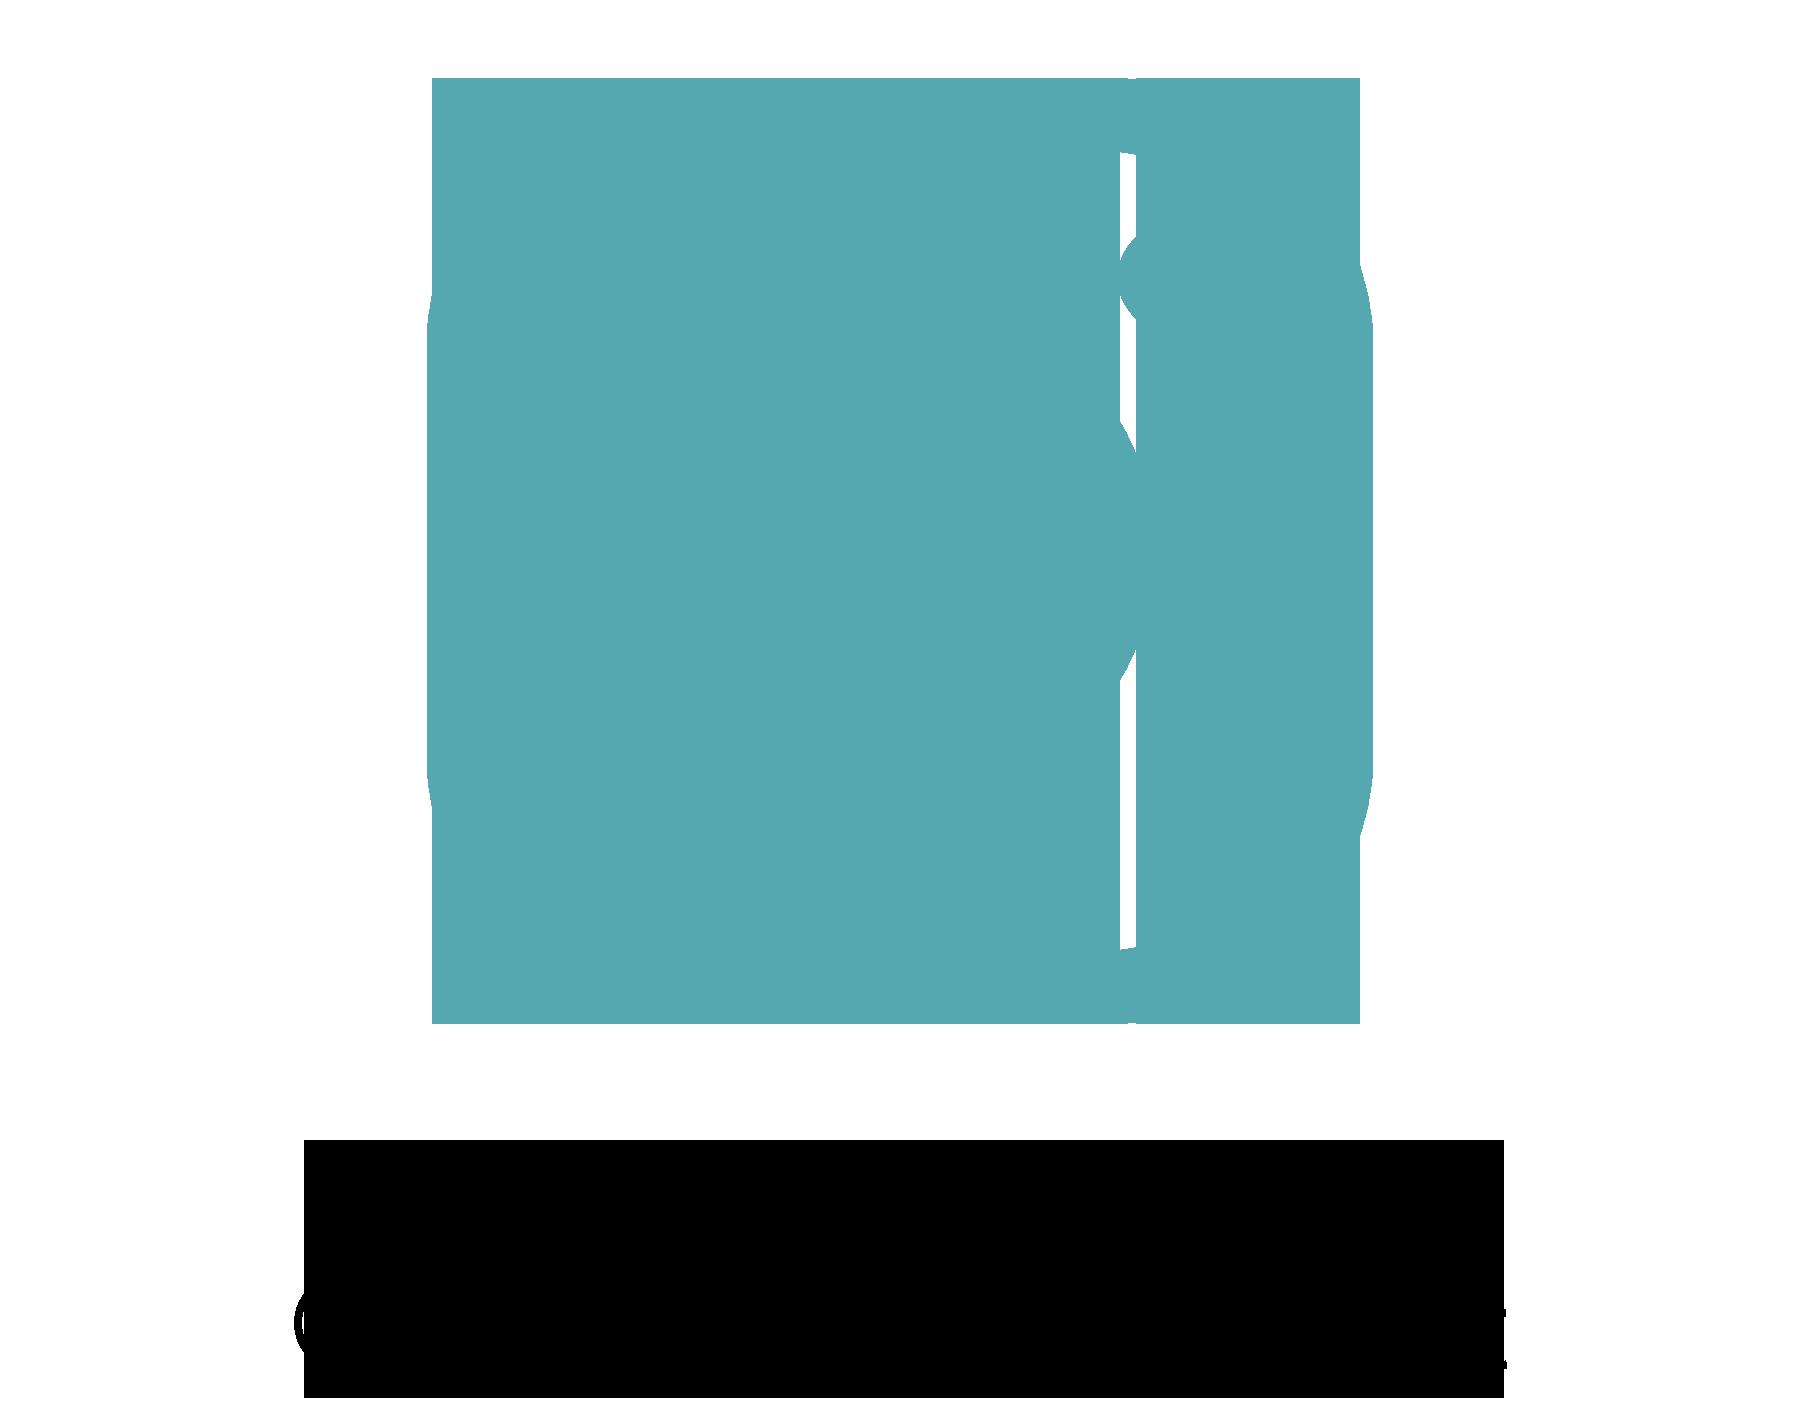 Image of Instagram logo. Follow us at LoveStruckInKeyWest account.